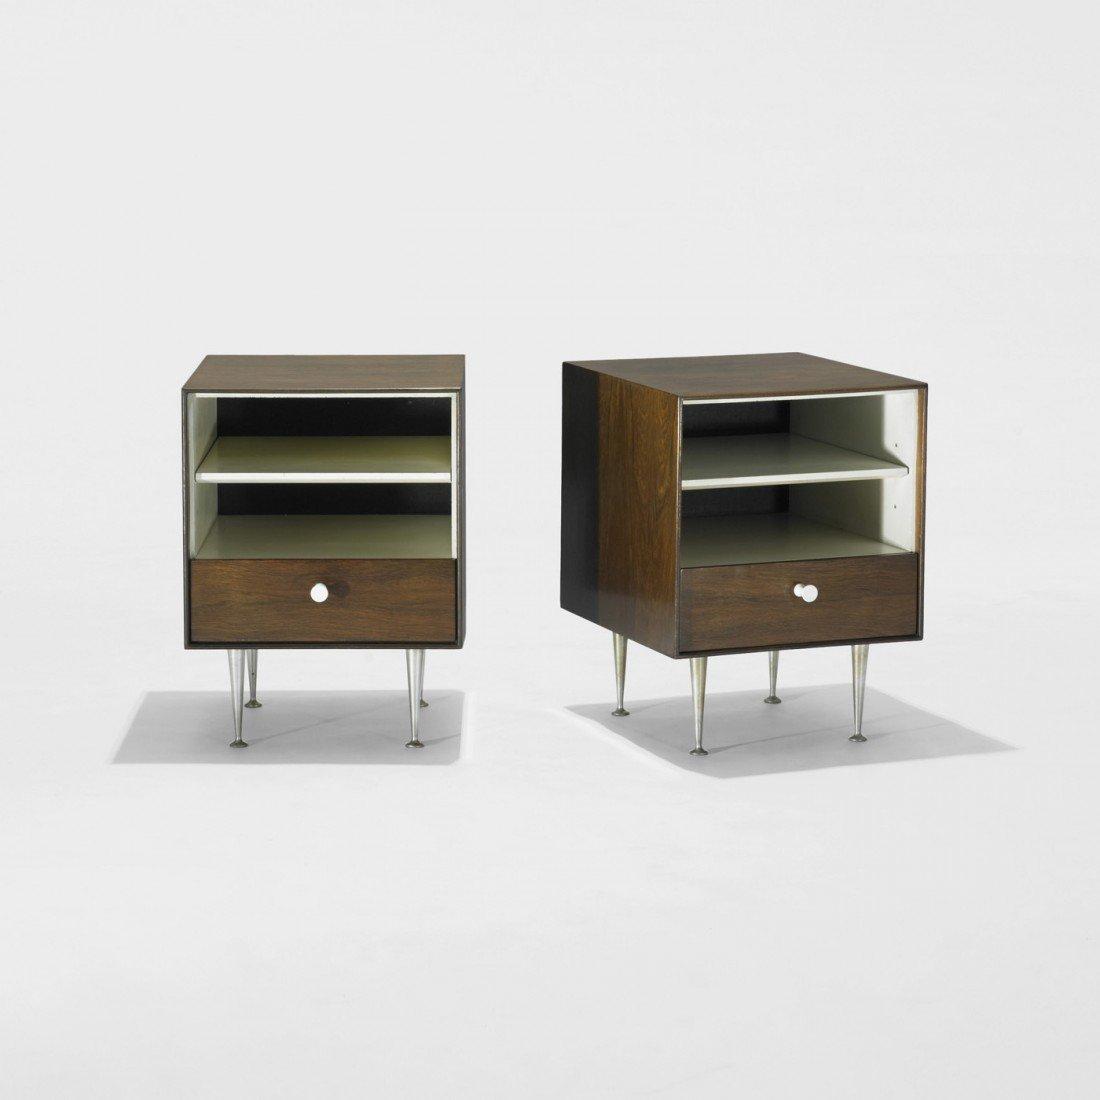 123: Nelson & Associates Thin Edge nightstands, pair